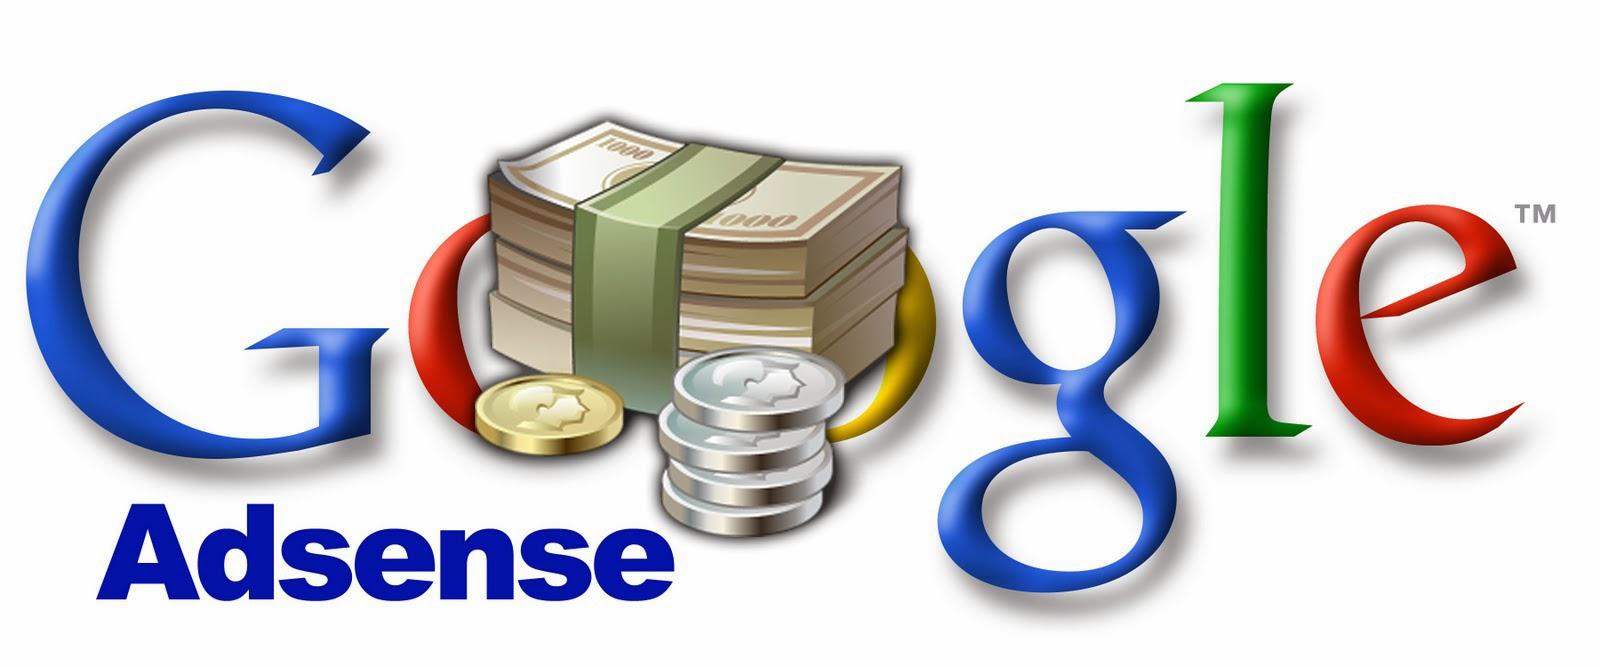 Study Adsense Google: How to reg Google Adsense successful